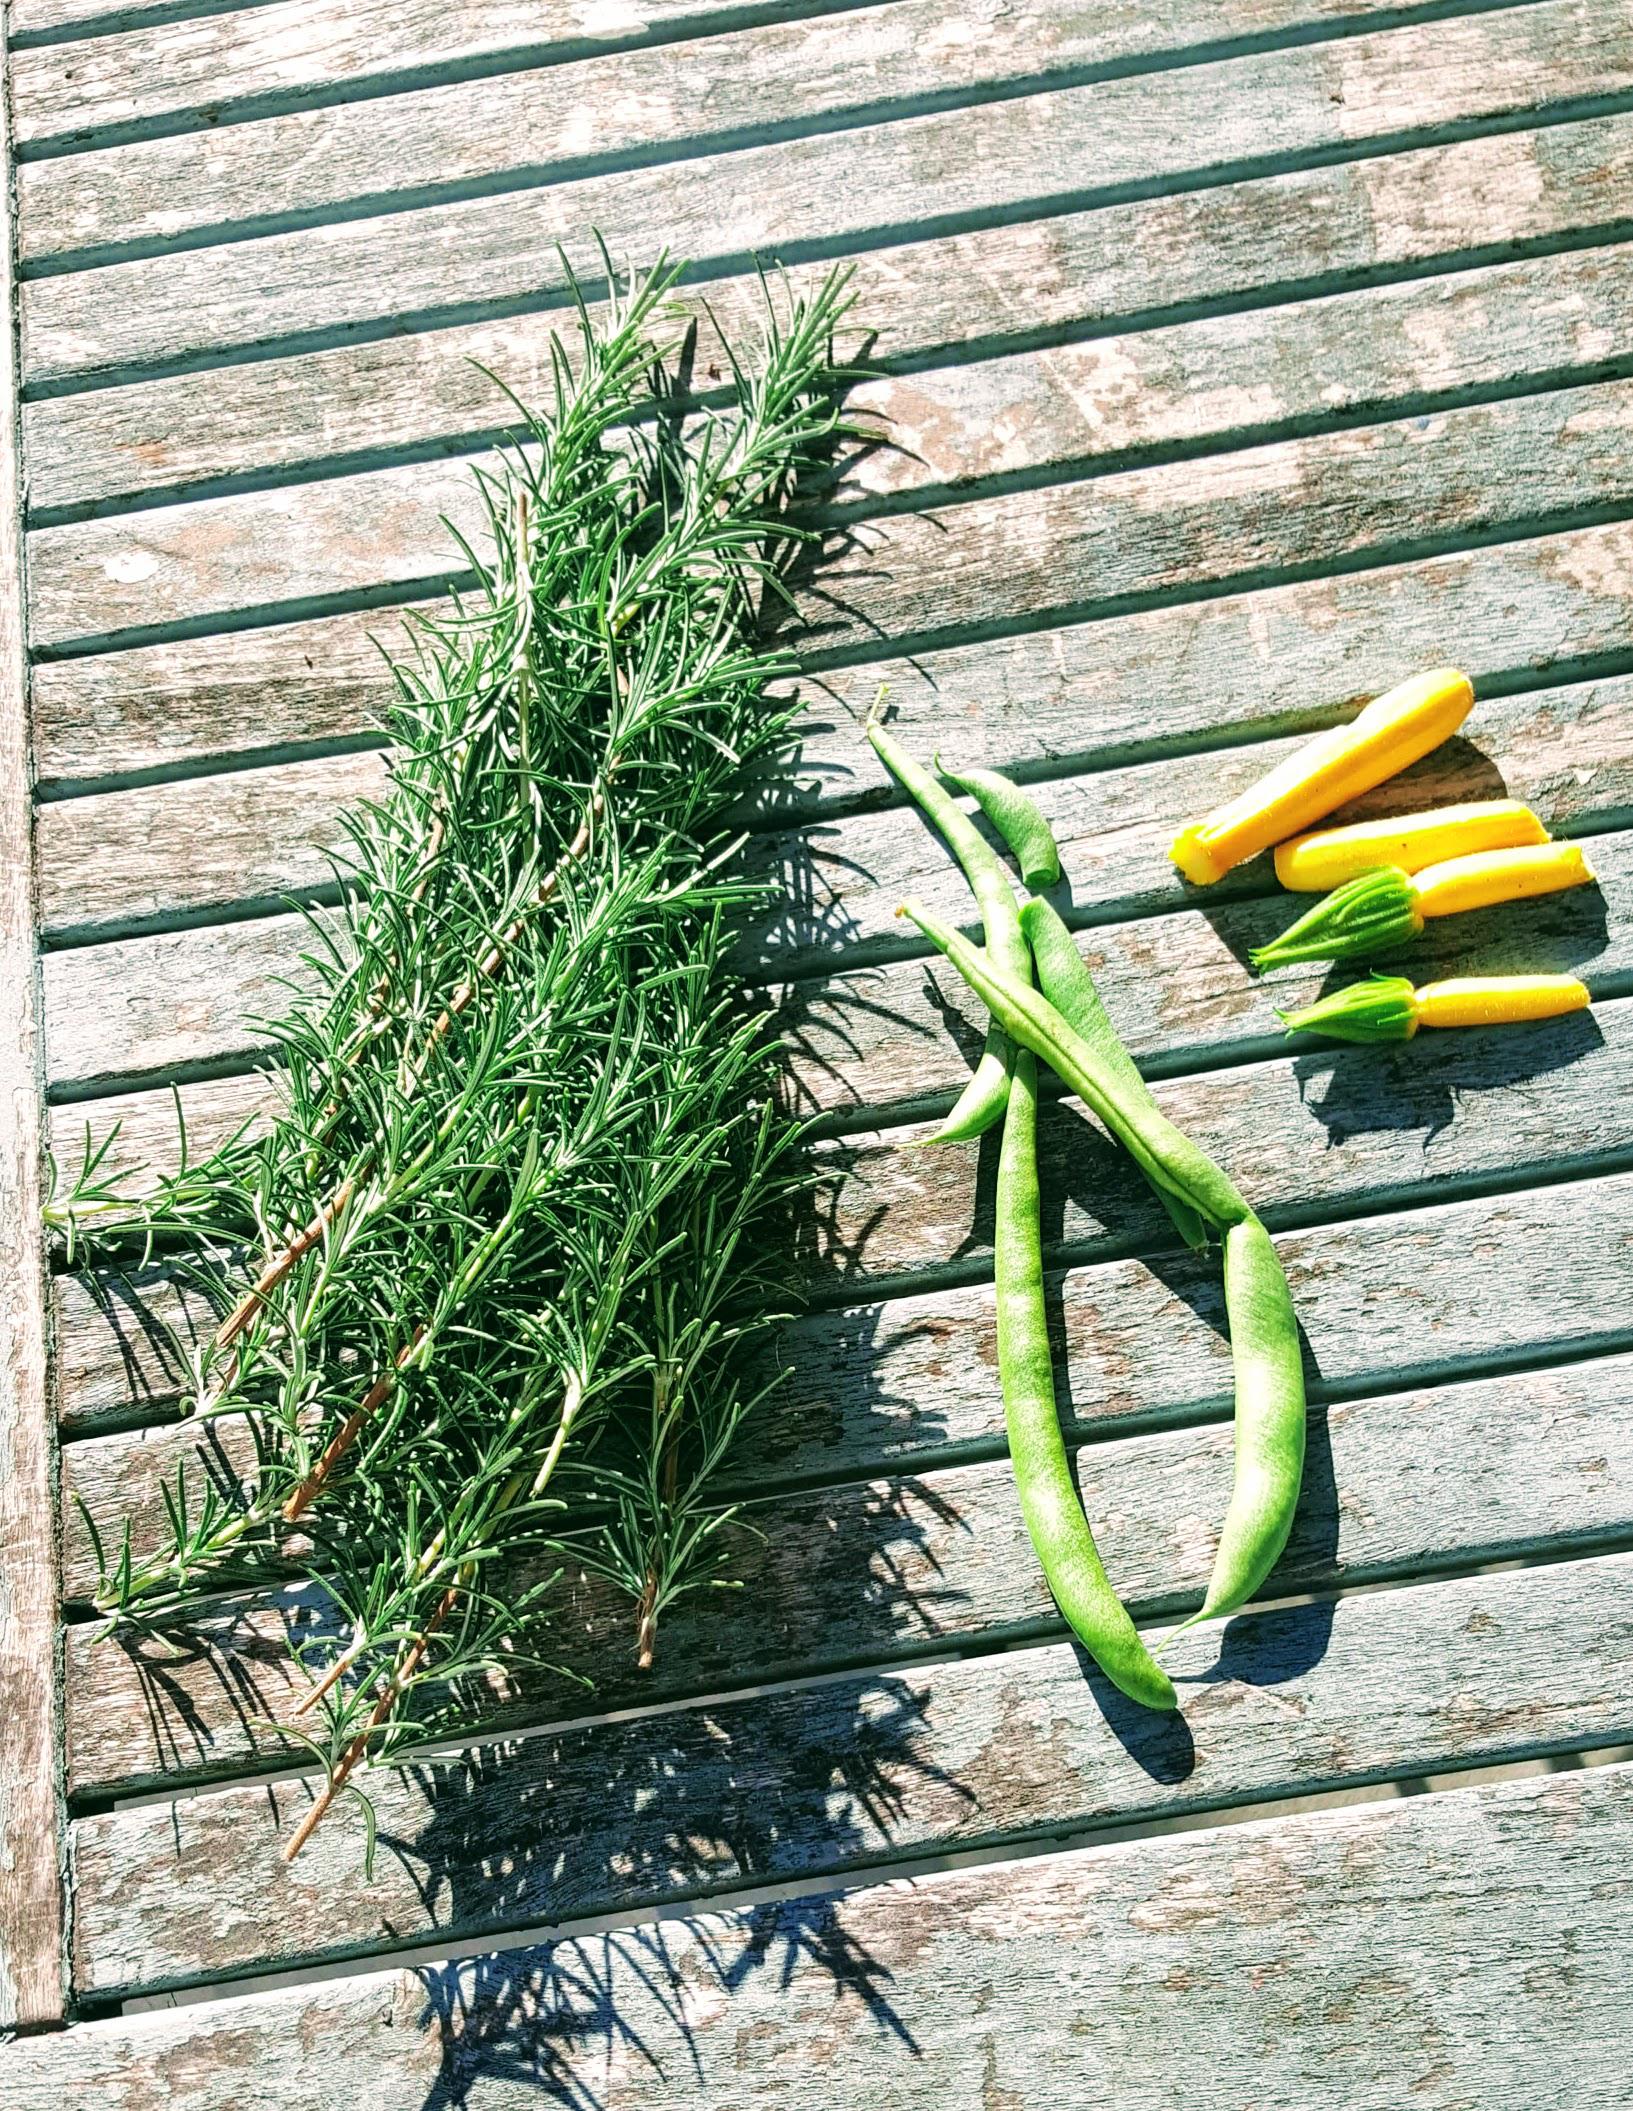 The last garden produce of 2018